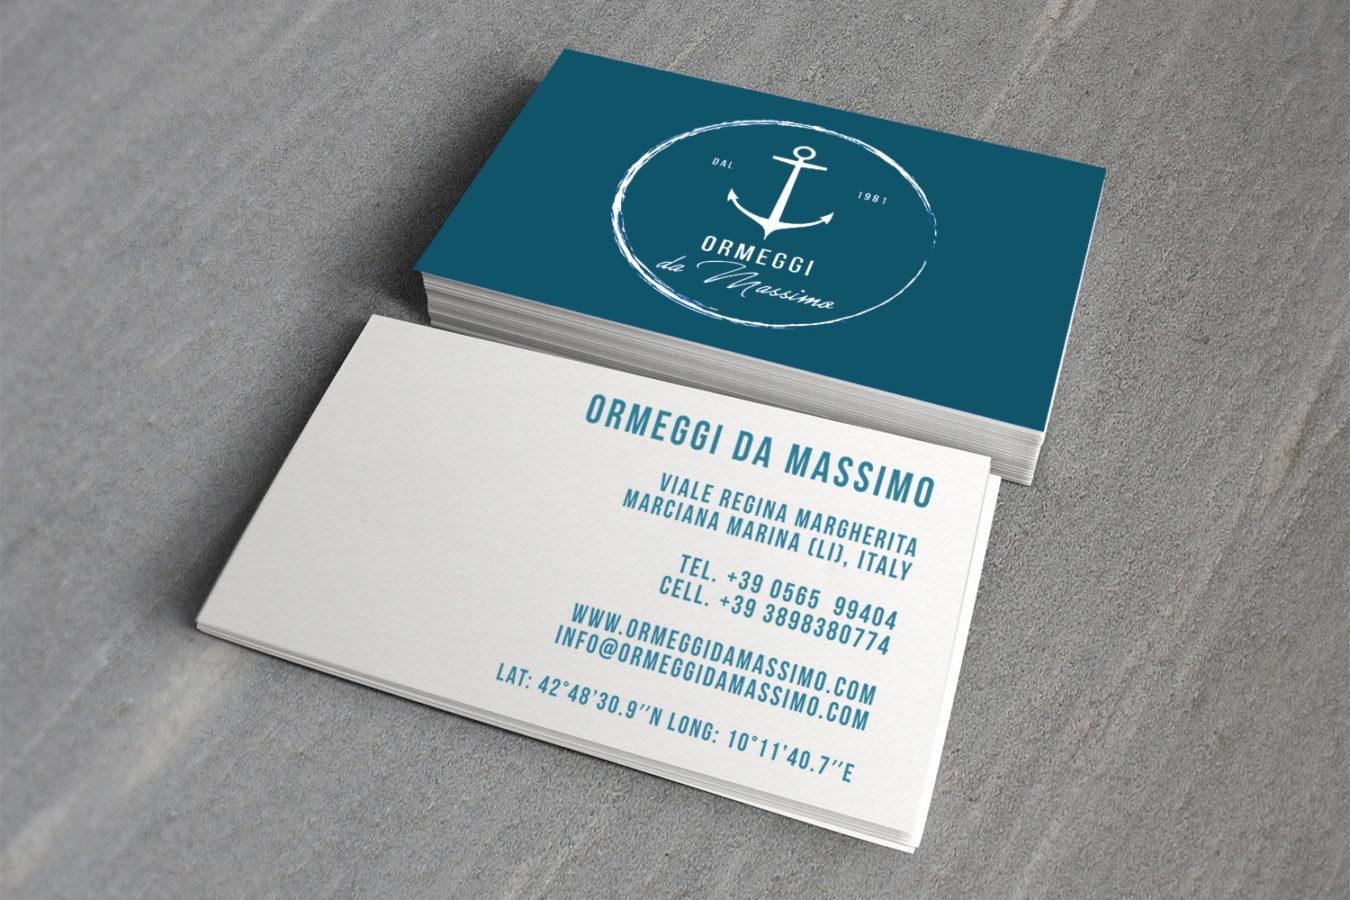 Ormeggi da Massimo visa - Brignetti Longoni Design Studio